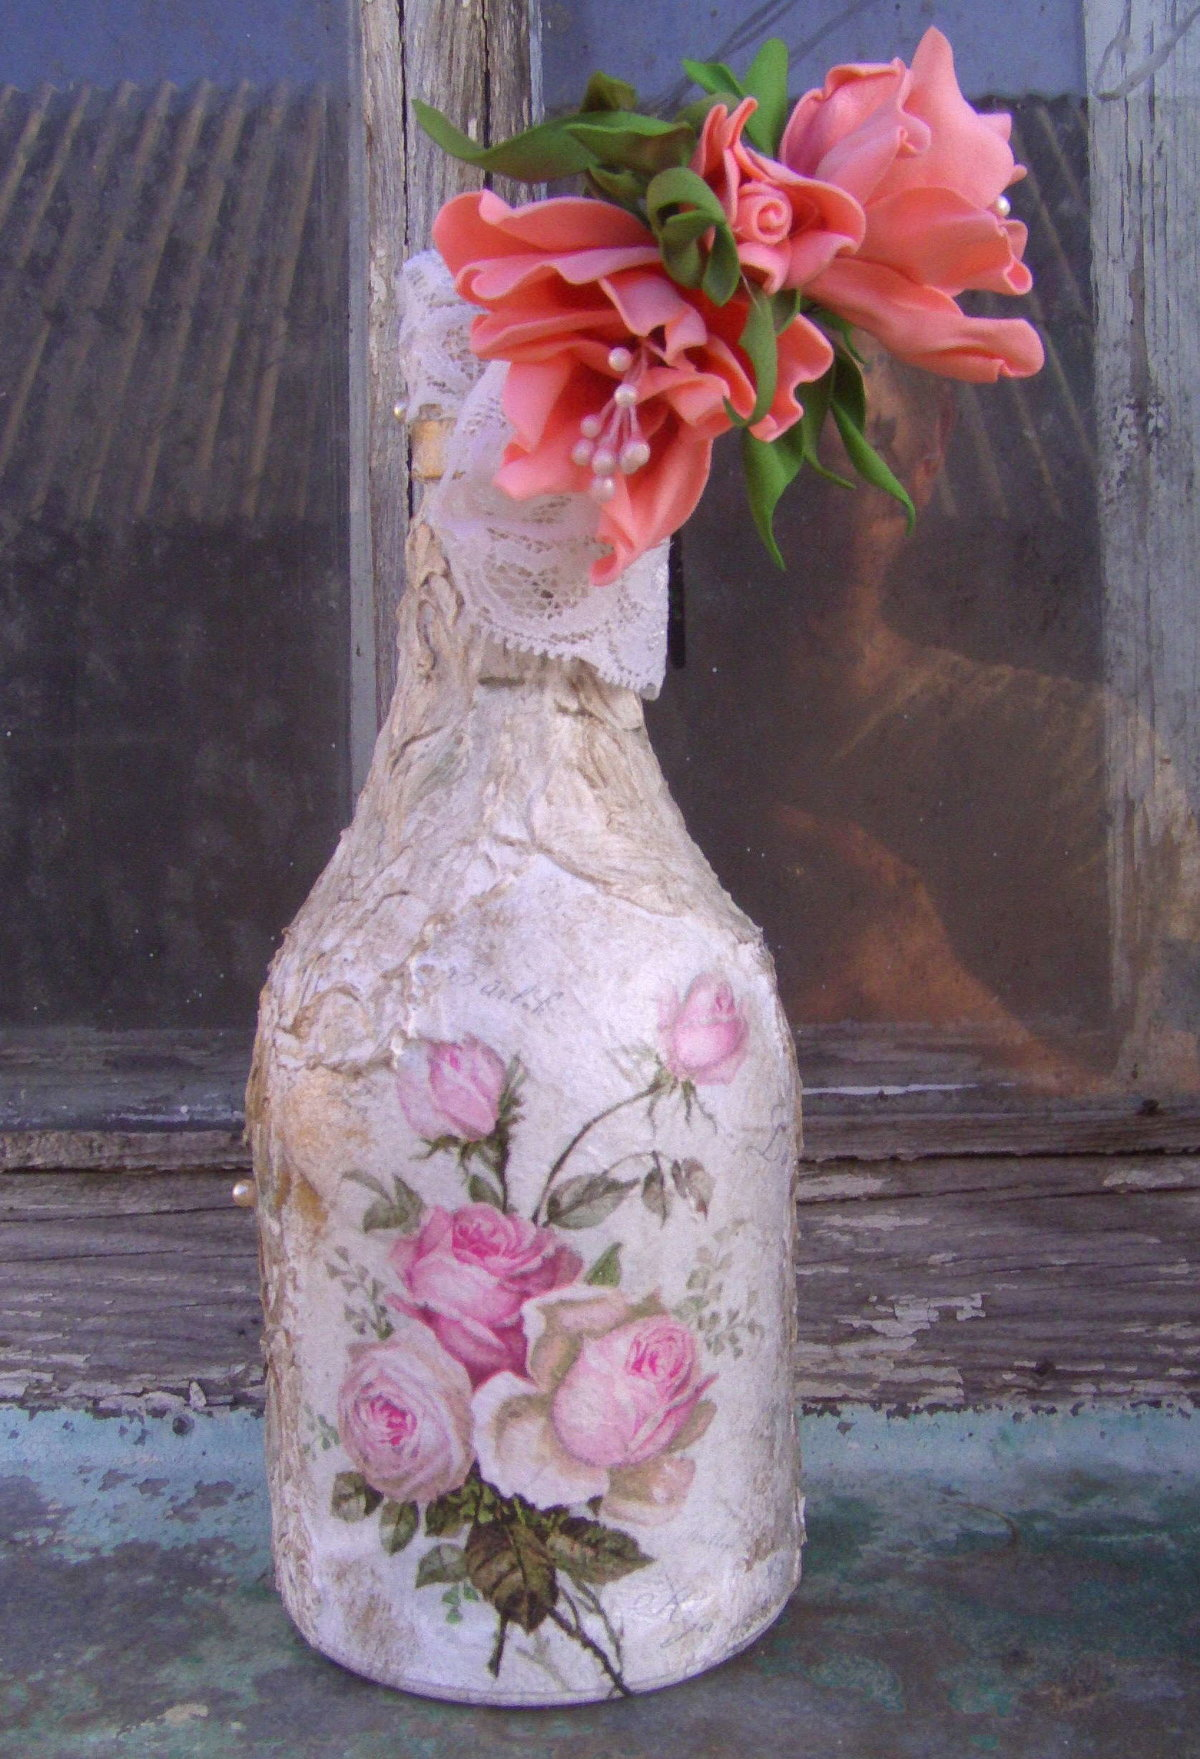 Бутылка с цветами картинка